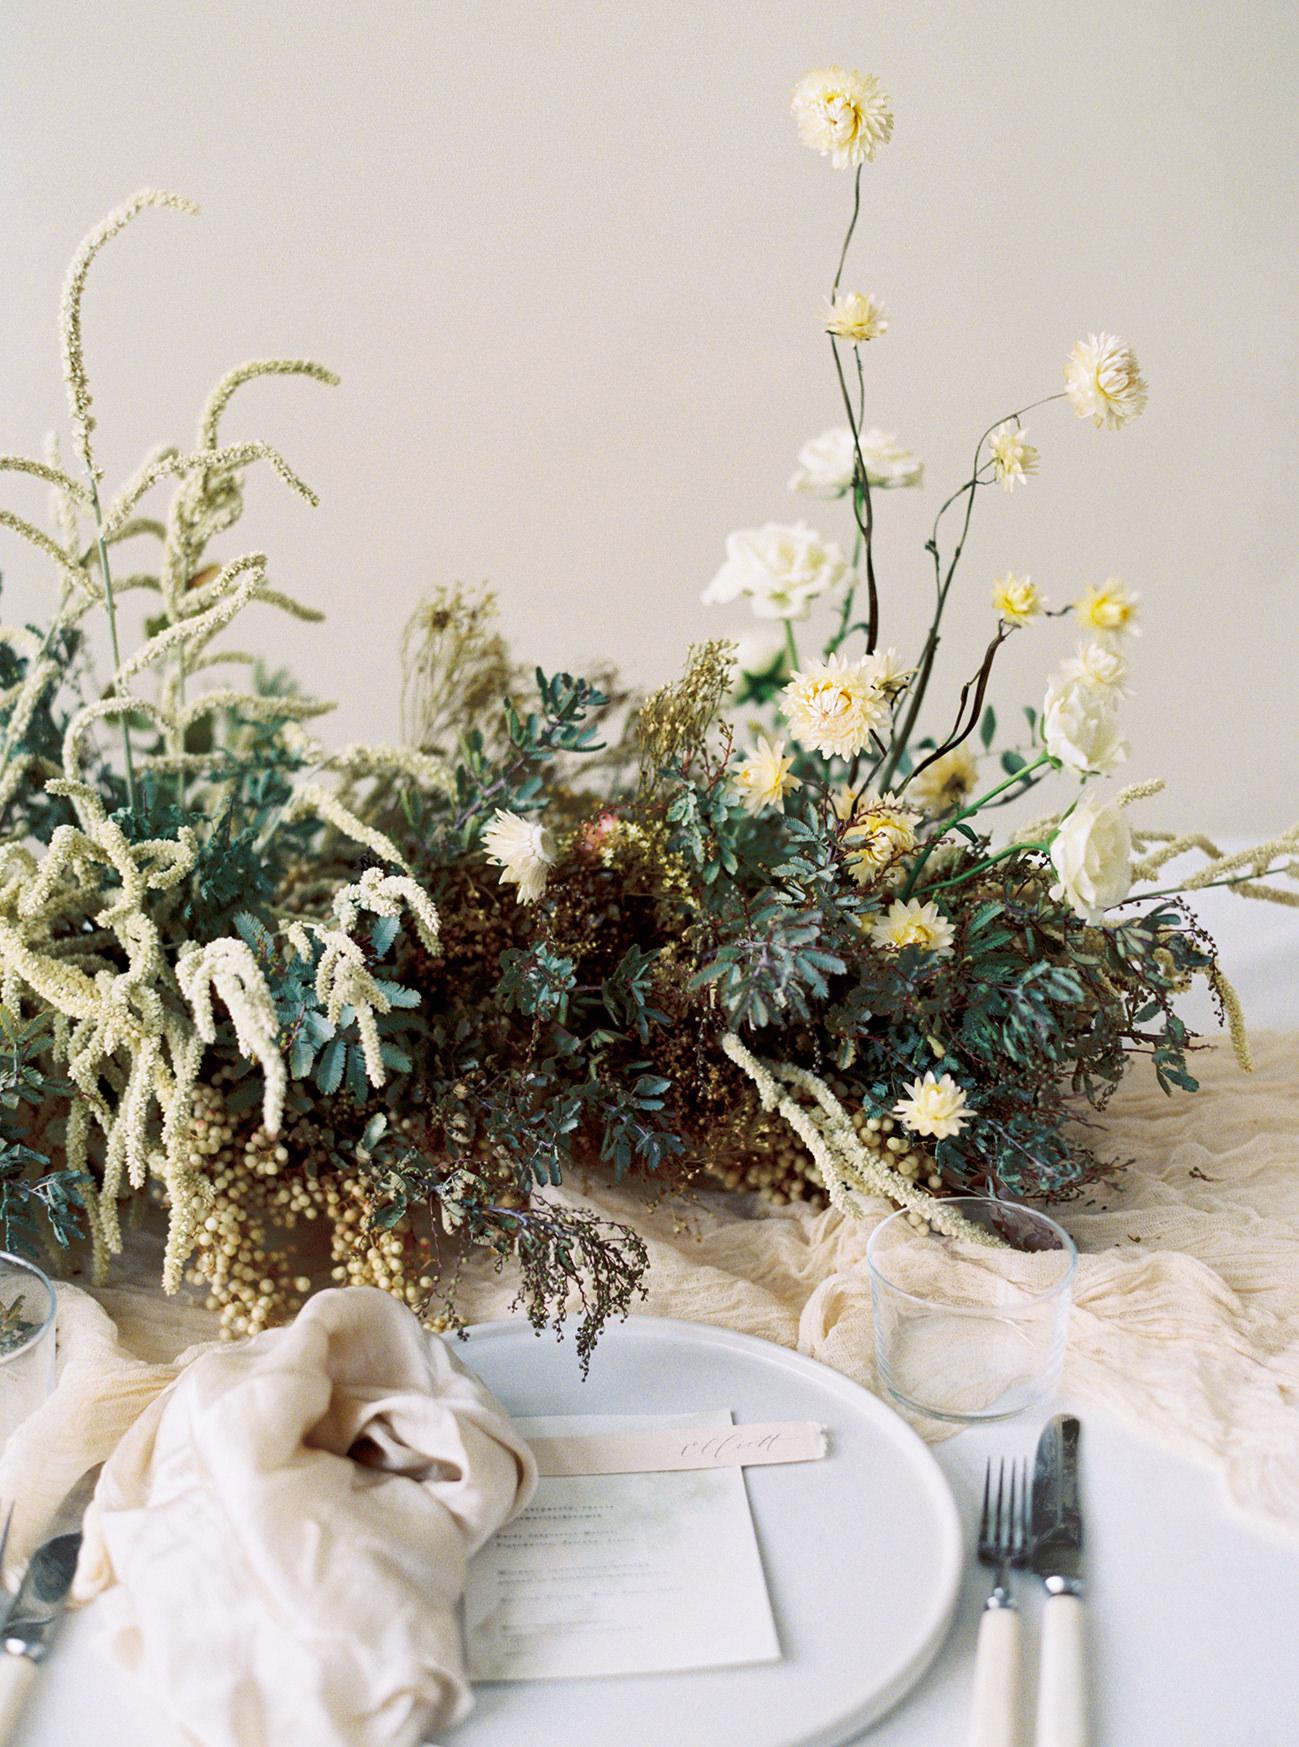 Bridal Inspiration, Wedding Bouquet, Hääkuvaus, Film Wedding Photographer, Table Setting Inspiration, Stationery, Dried Flowers, www.nordandmae.com, www.susannanordvall (18).jpg